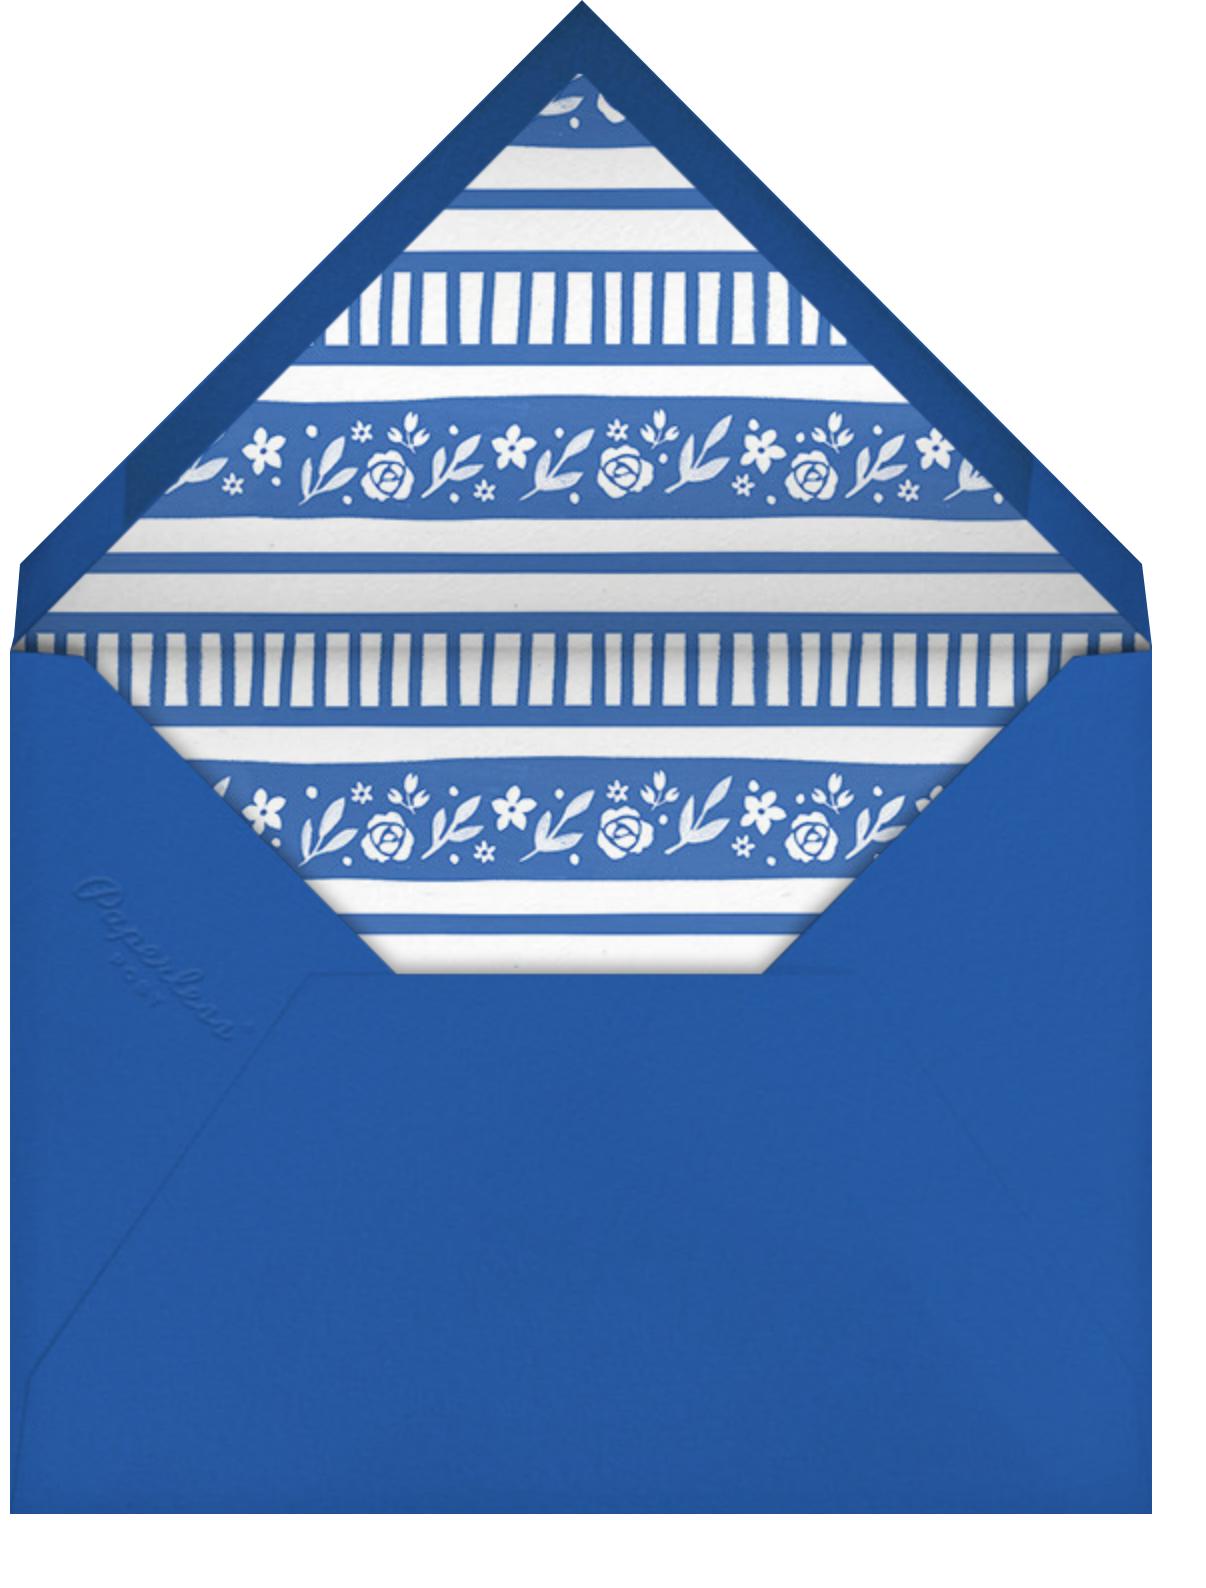 Seder Soup - Paperless Post - Passover - envelope back